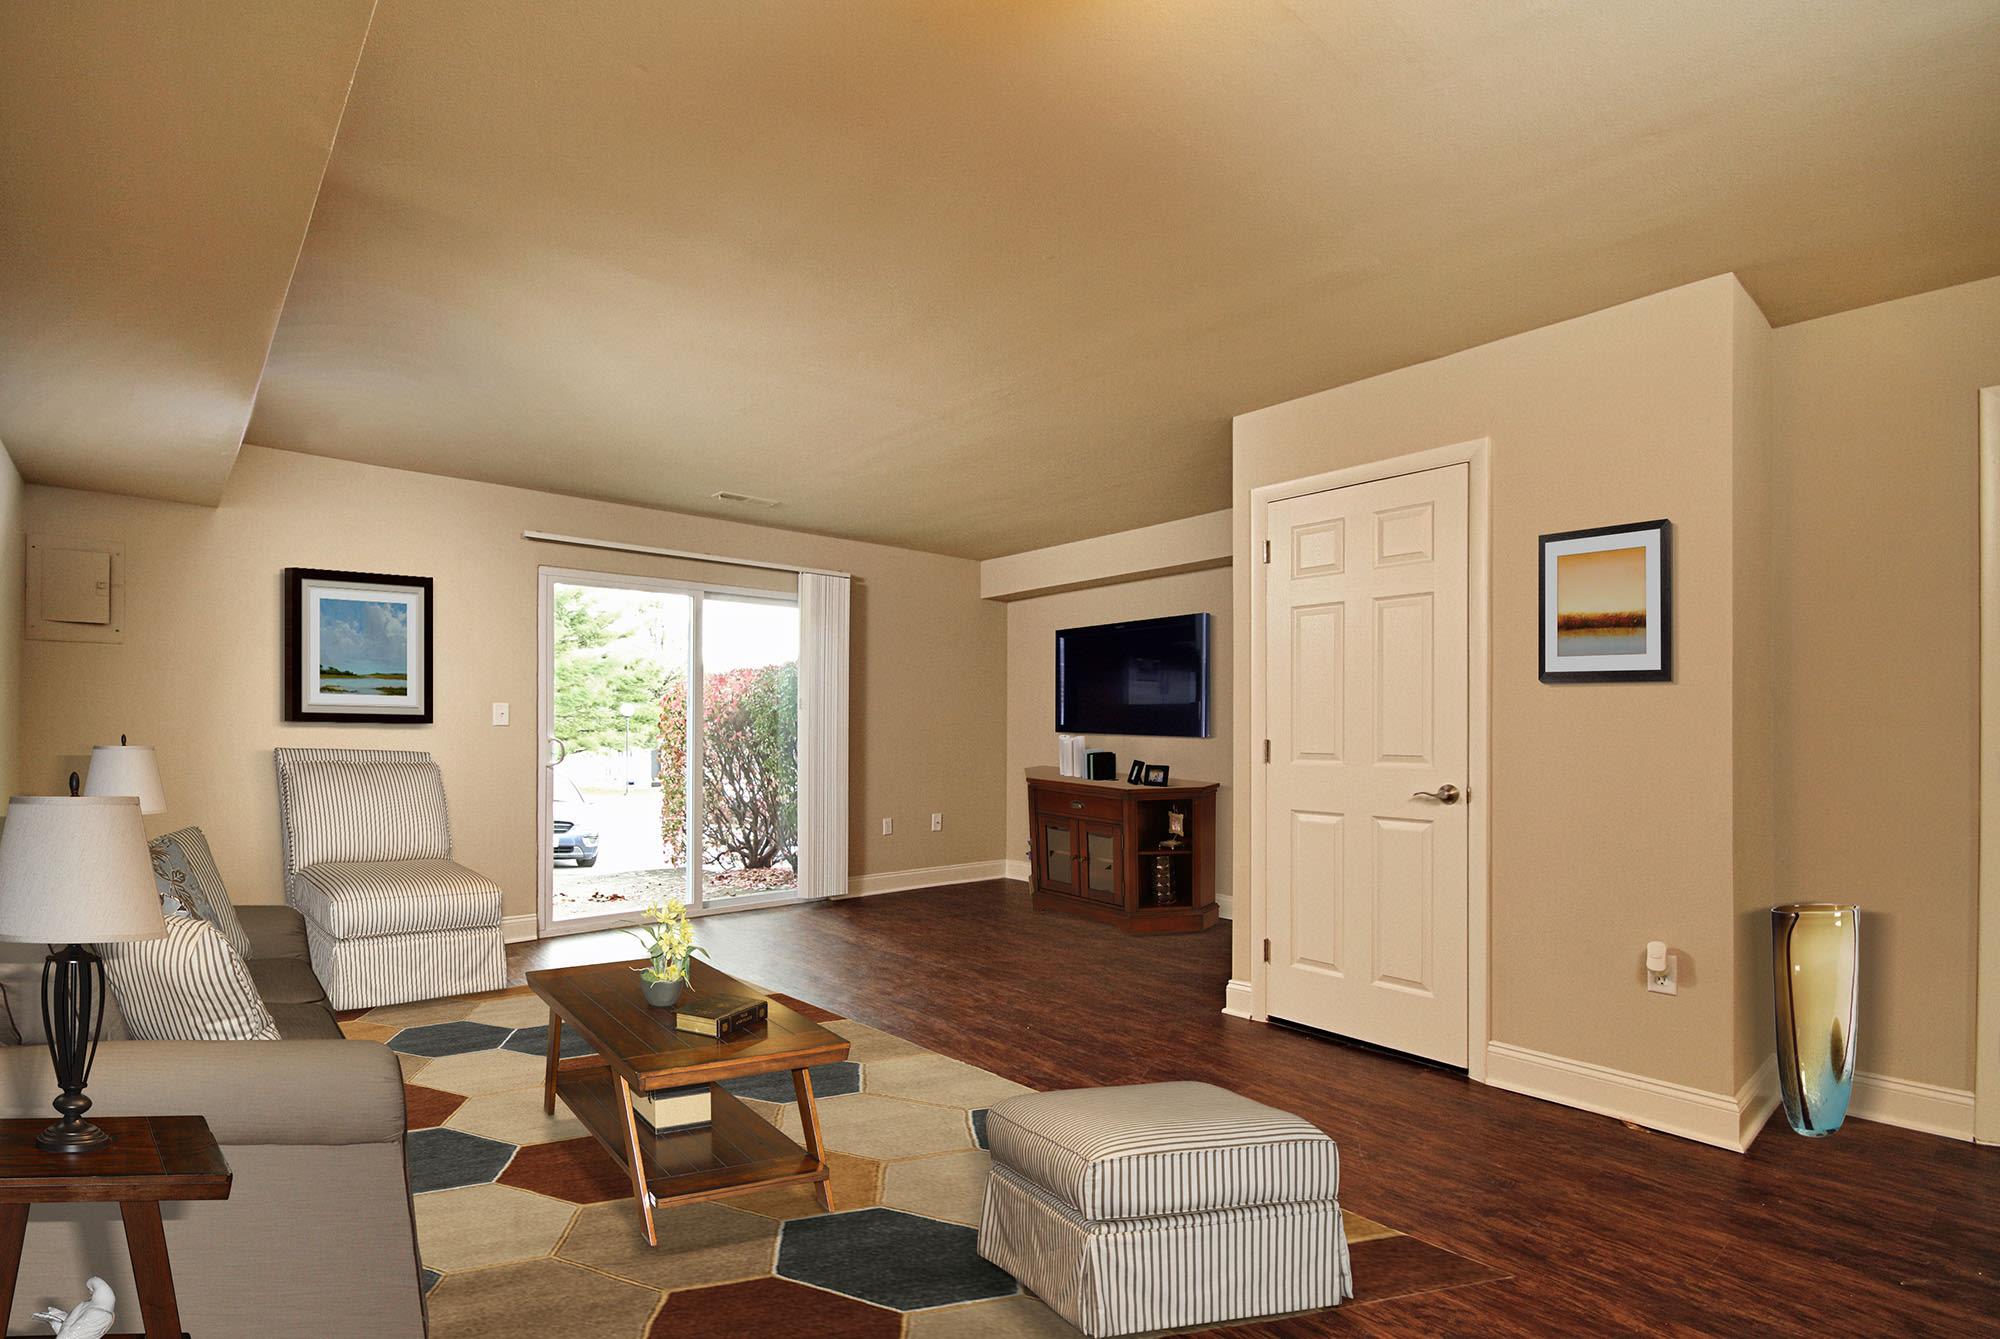 Apartments at The Village of Laurel Ridge in Harrisburg, Pennsylvania